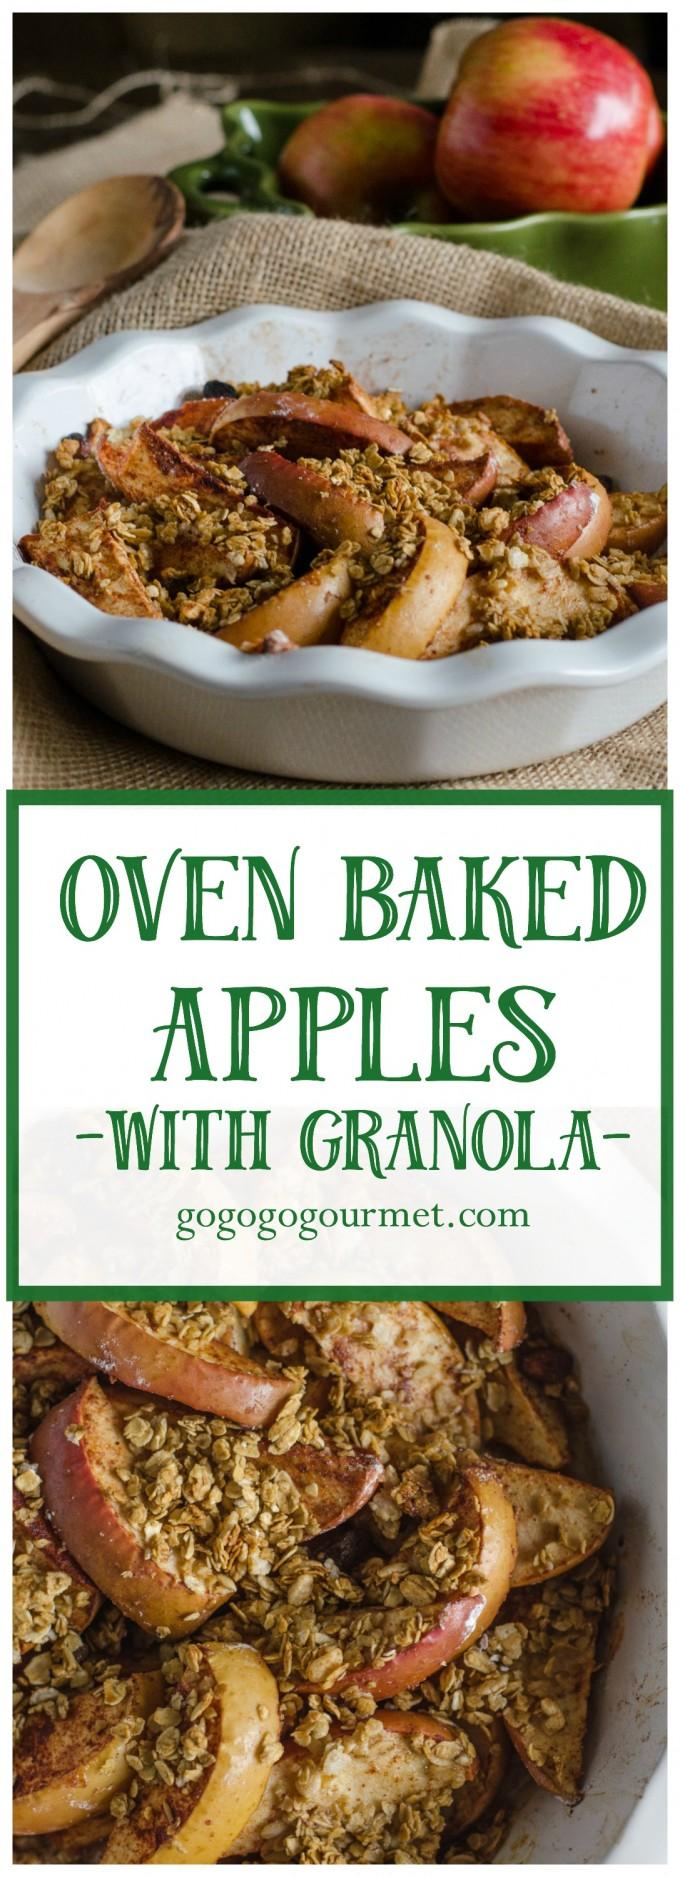 A new, super-easy fall side dish! Oven Baked Apples with Granola | Go Go Go Gourmet @gogogogourmet via @gogogogourmet